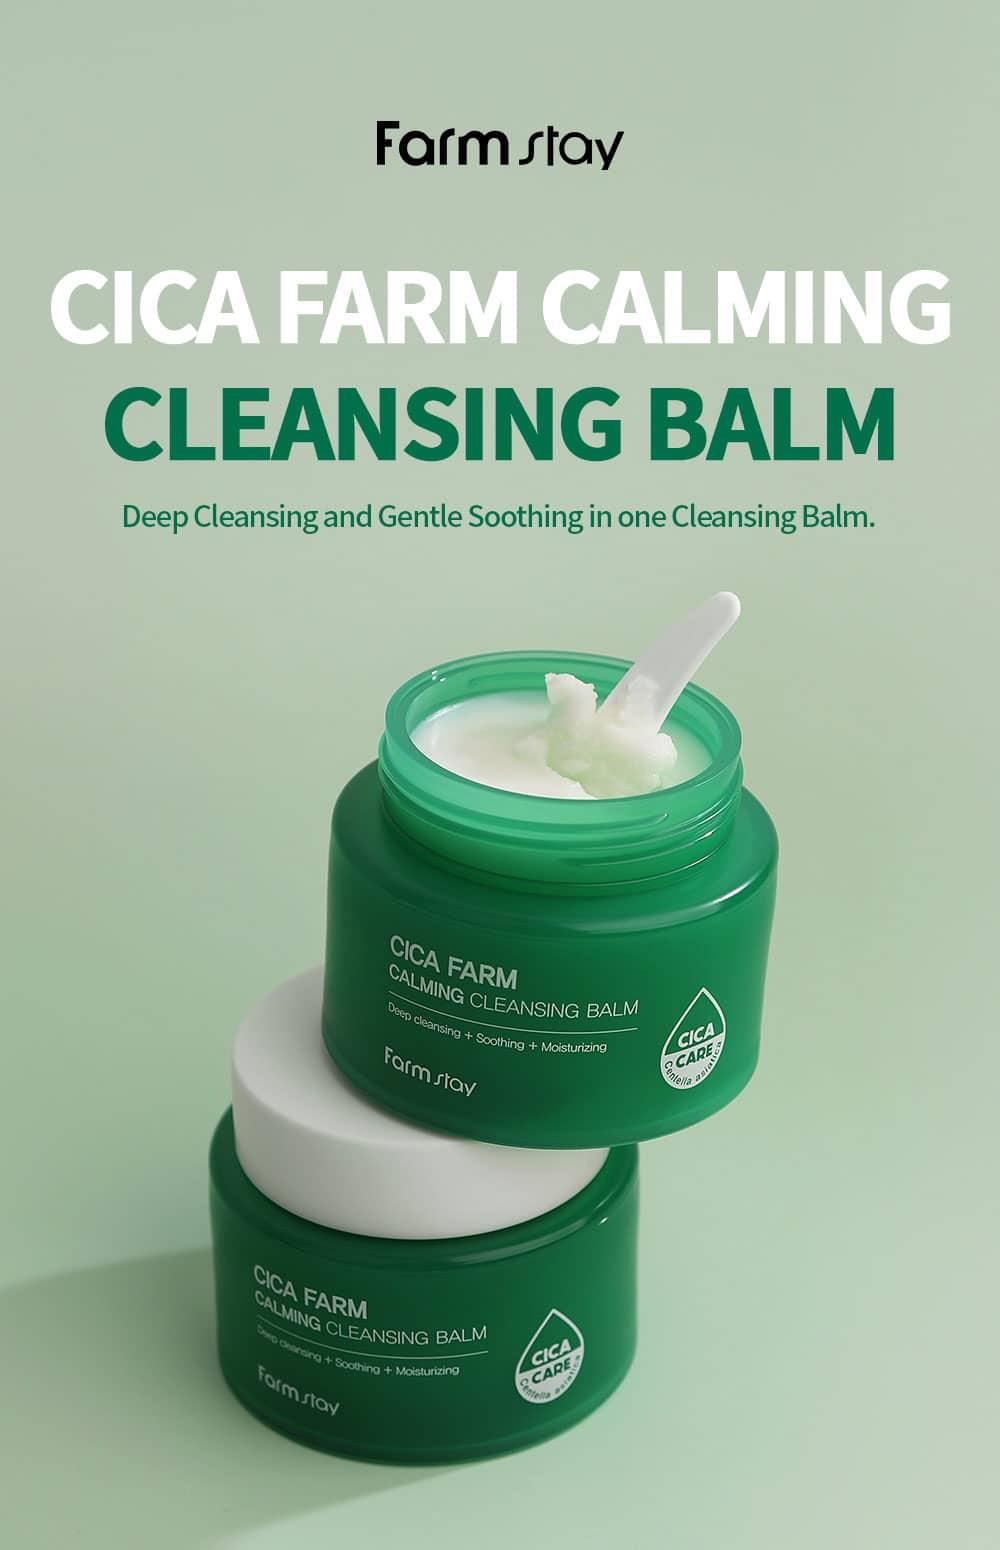 Farmstay Cica Farm Calming Cleansing Balm Description image